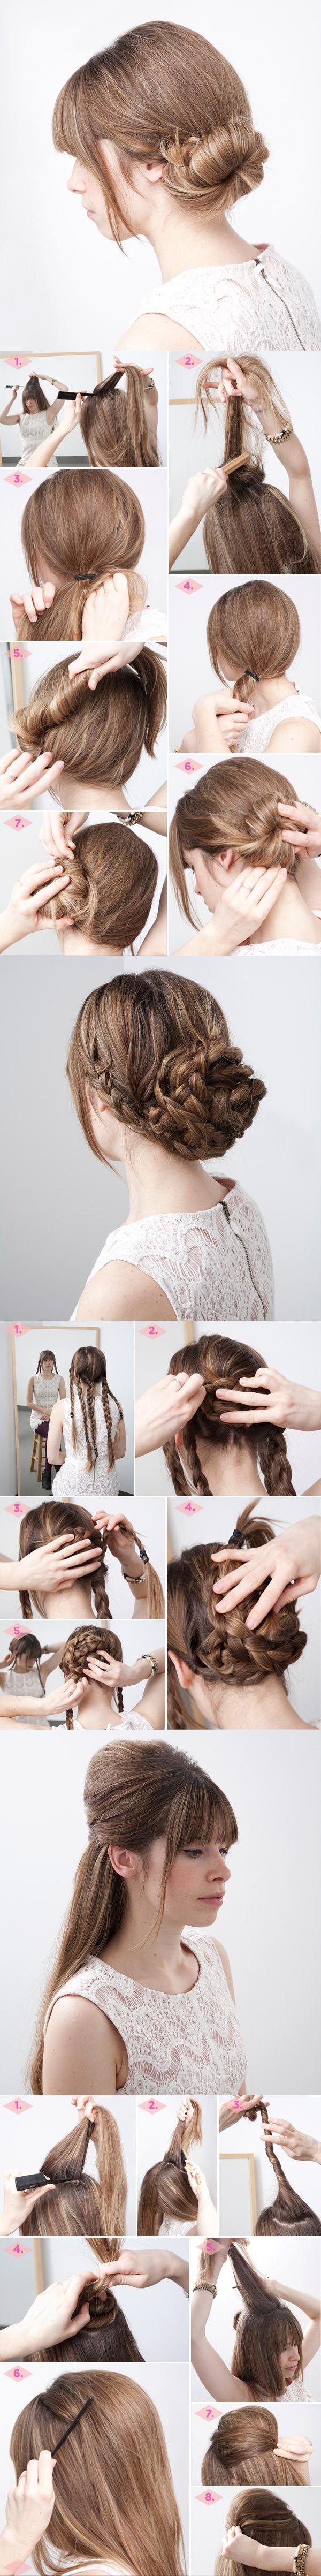 Terrific 13 Rather Simple Bun Hairstyles Tutorials For 2014 Pretty Designs Short Hairstyles Gunalazisus